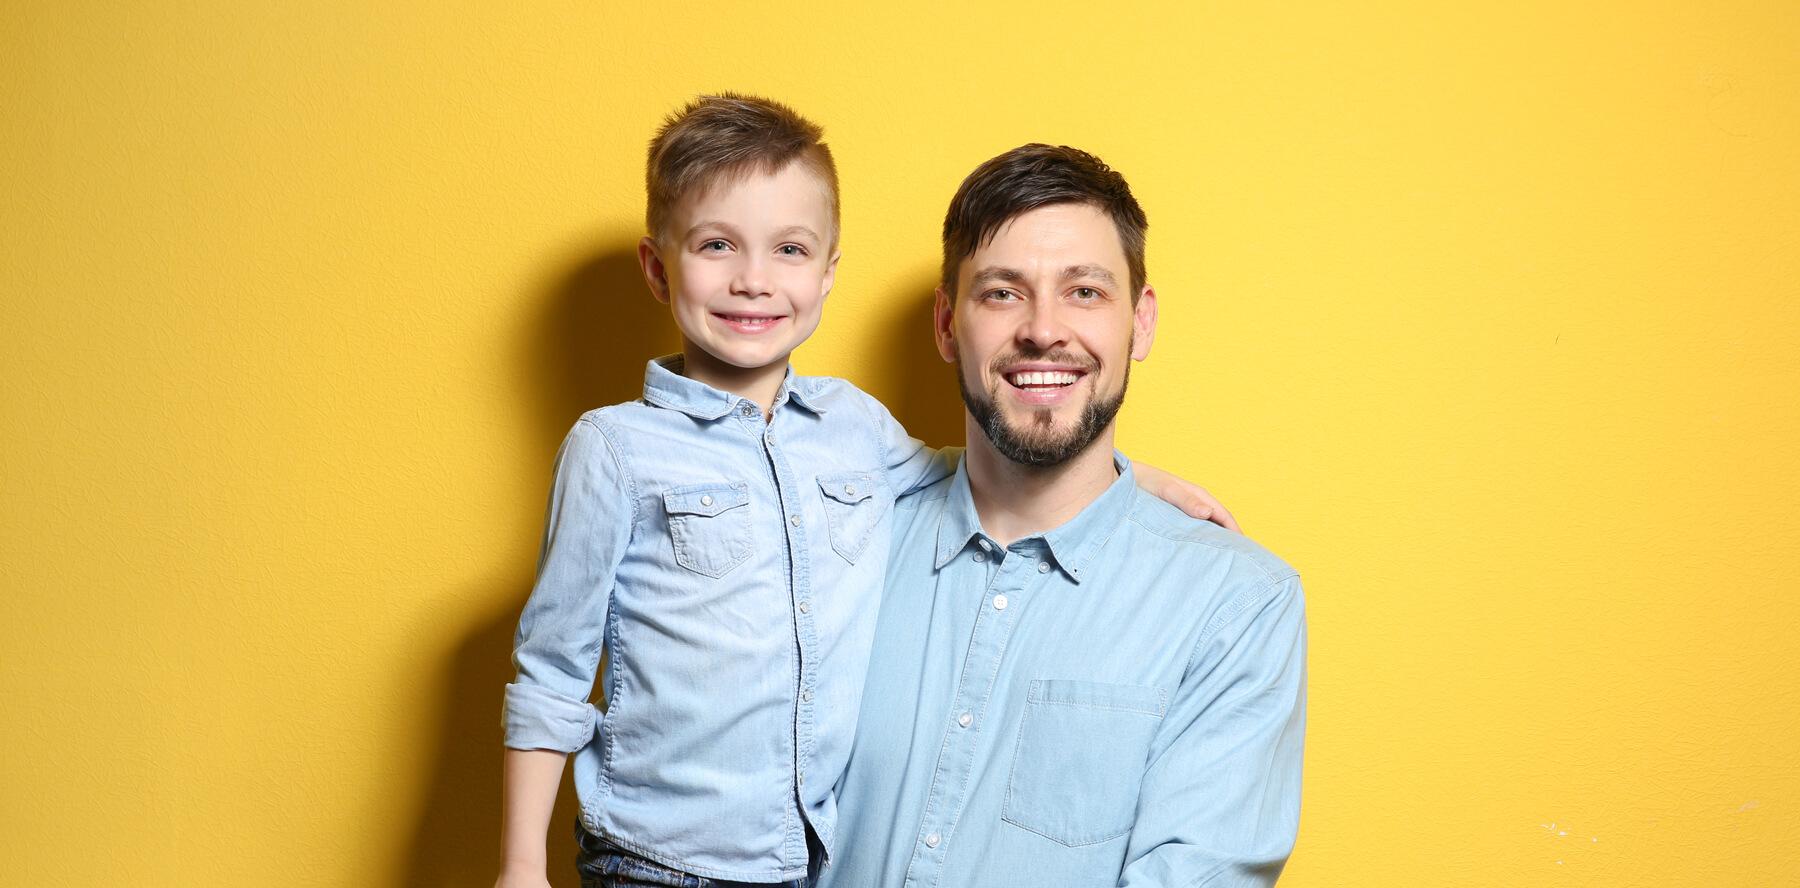 Early Start Speech Pathology Funding Options